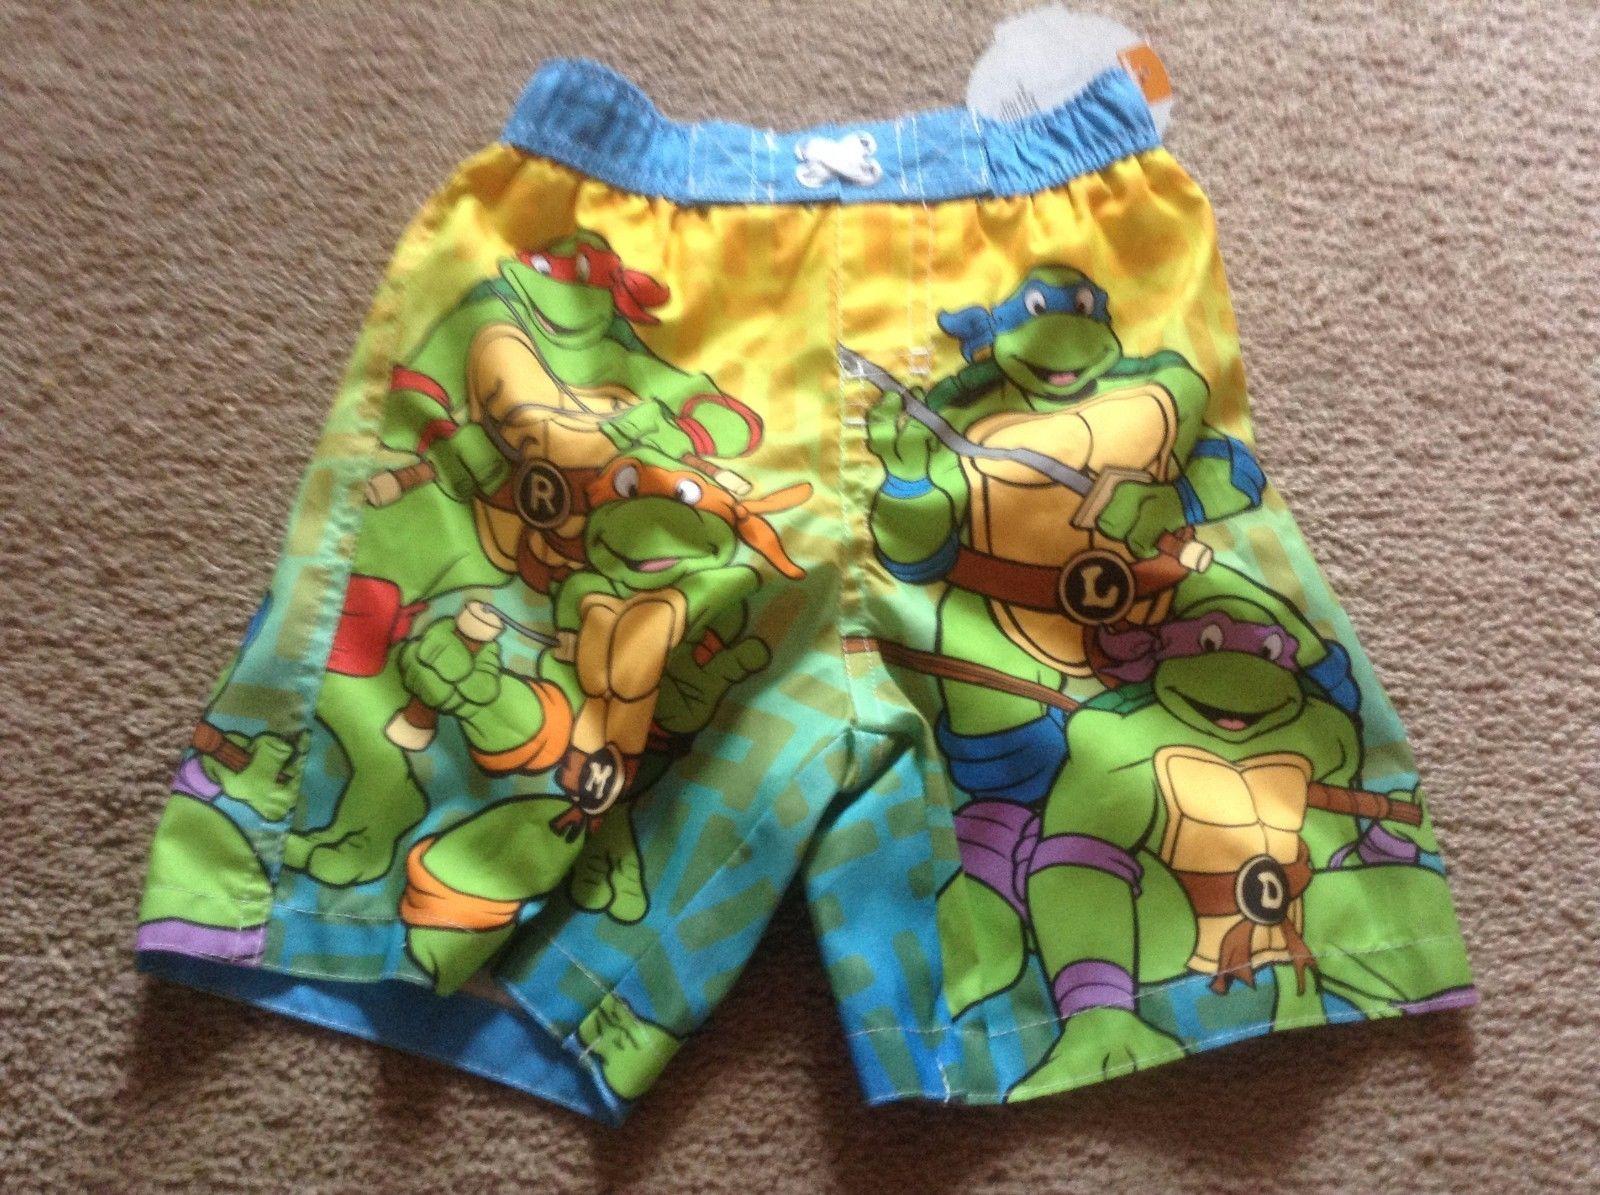 505e1deb16 S l1600. S l1600. Nickelodeon Teenage Mutant Ninja Turtles Toddler Boy's  Swim Trunks ...